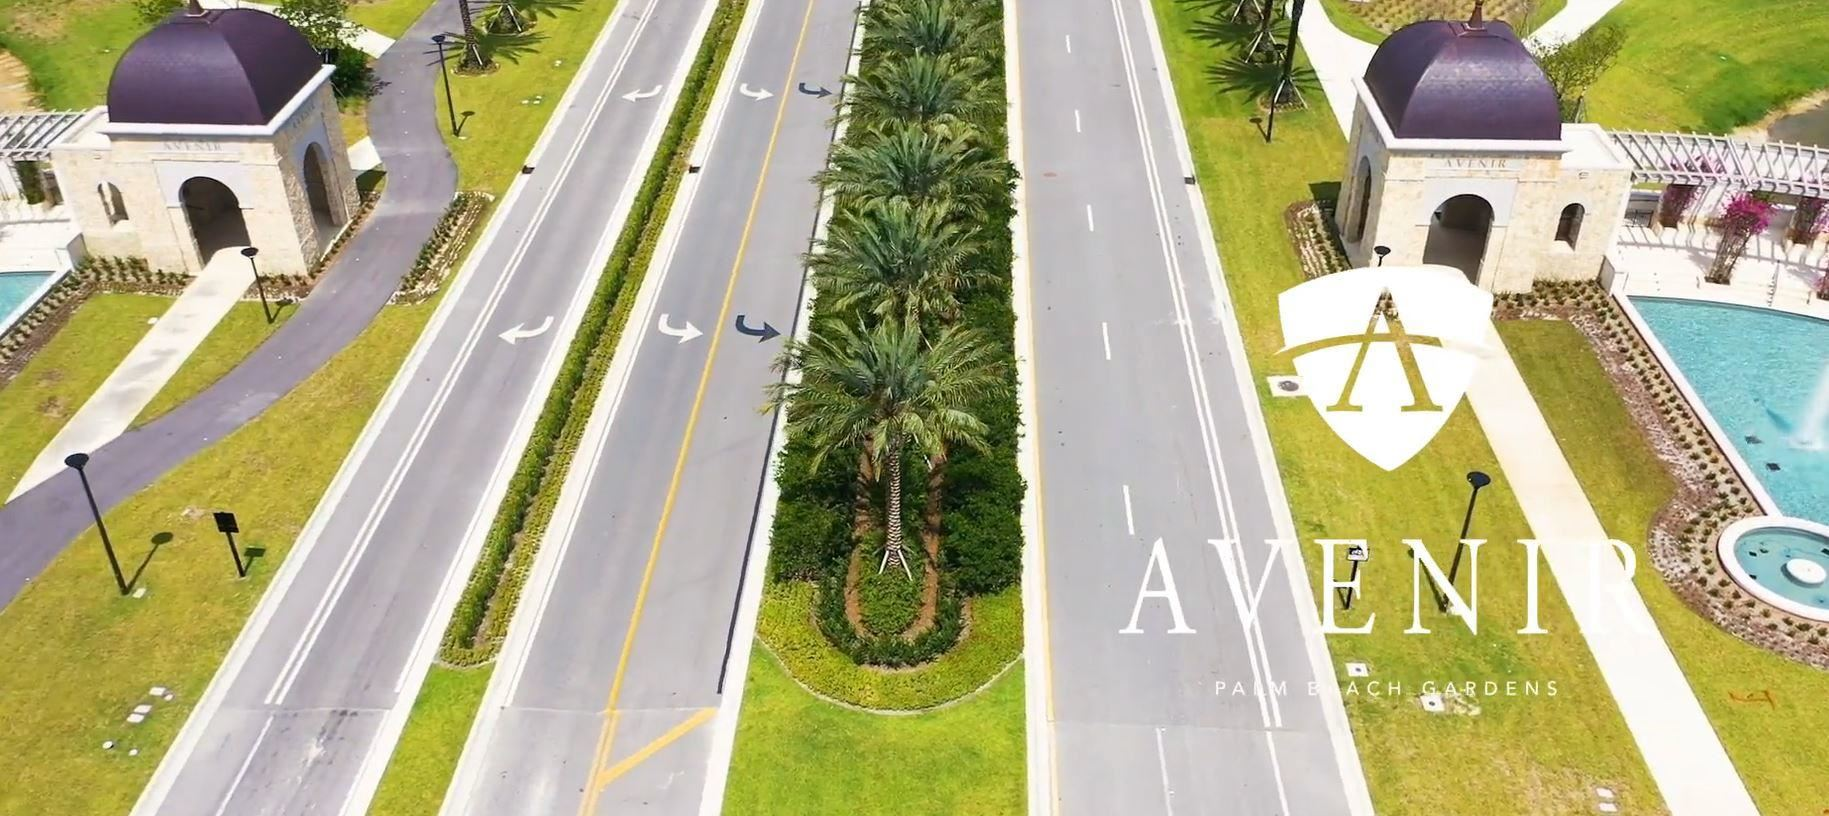 Photo of 9916 Timber Creek Way, Palm Beach Gardens, FL 33412 (MLS # RX-10697810)